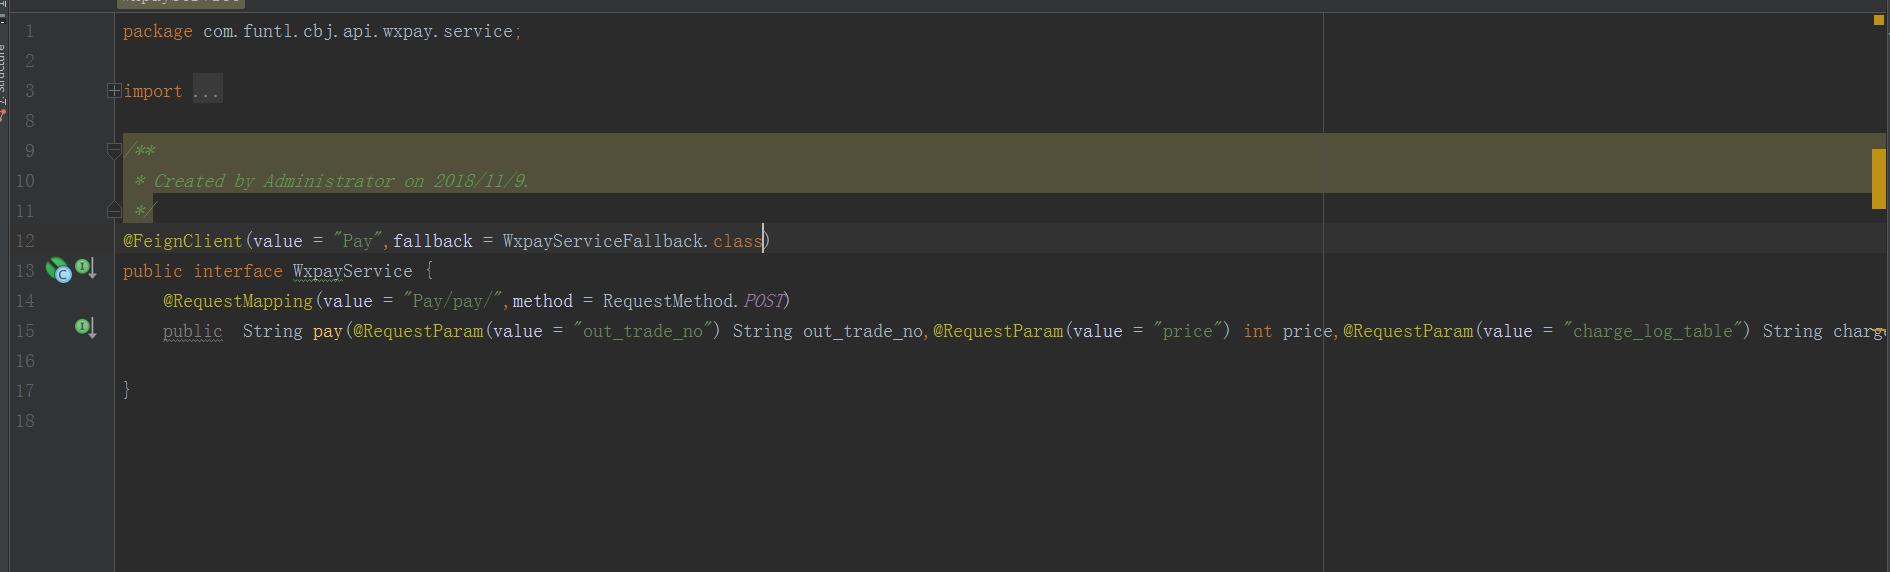 SpringCloud-Feign报404 一直找不到问题所在- OSCHINA